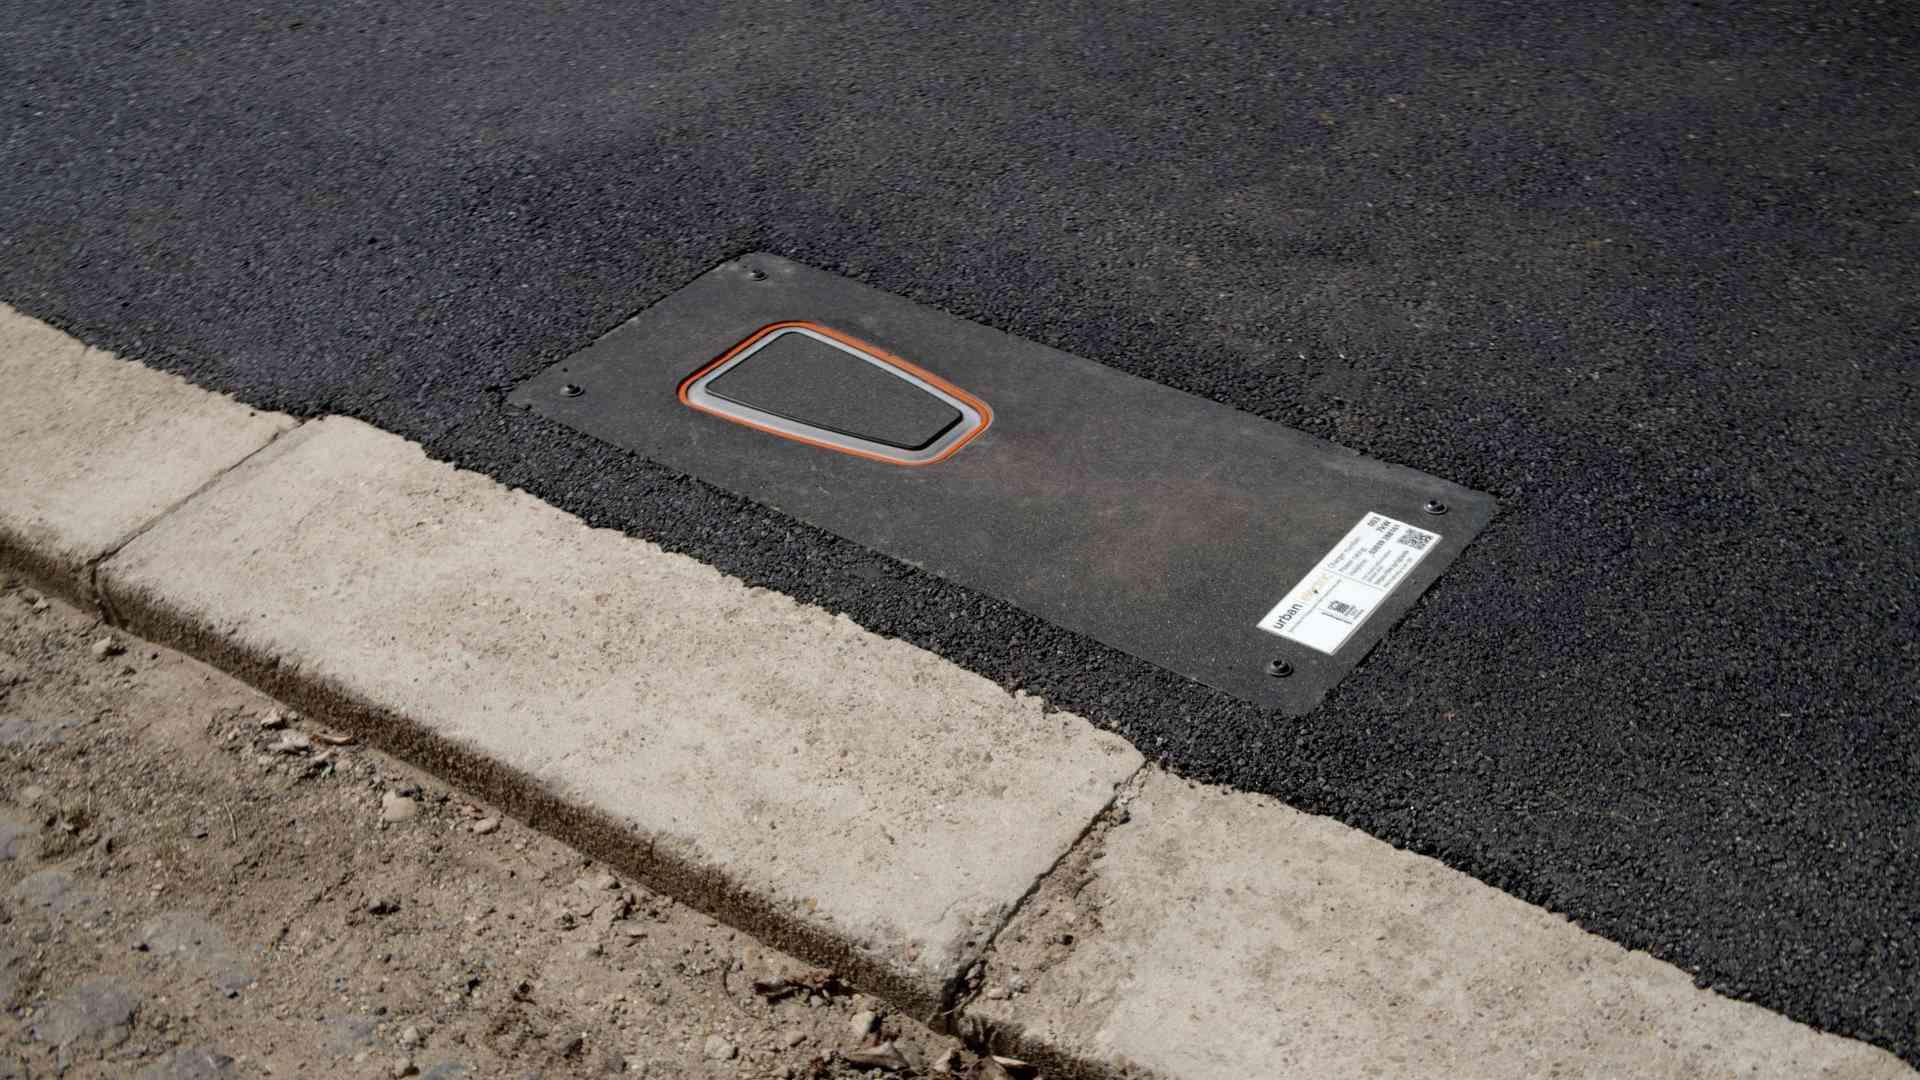 UEone in pavement down